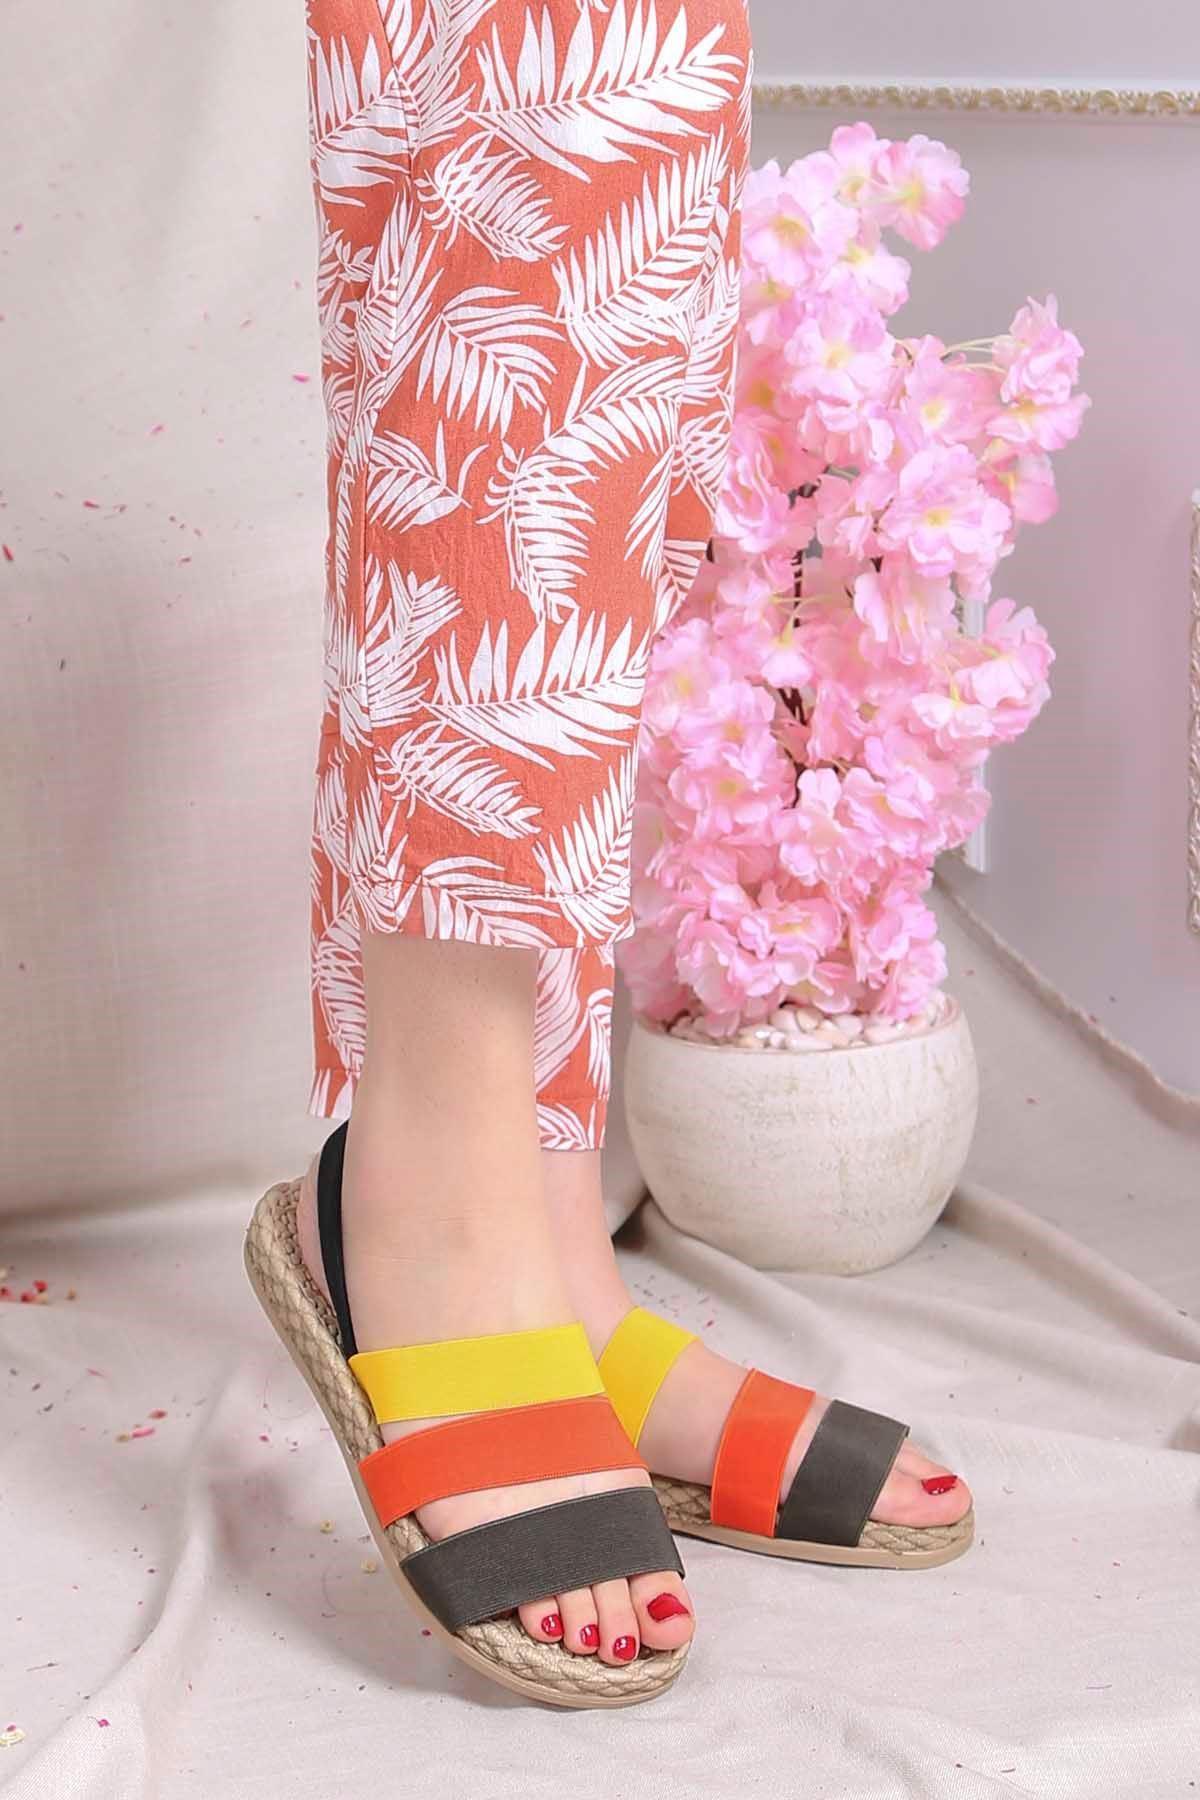 Brk-2020 Lastikli Sandalet Haki Turuncu Sarı